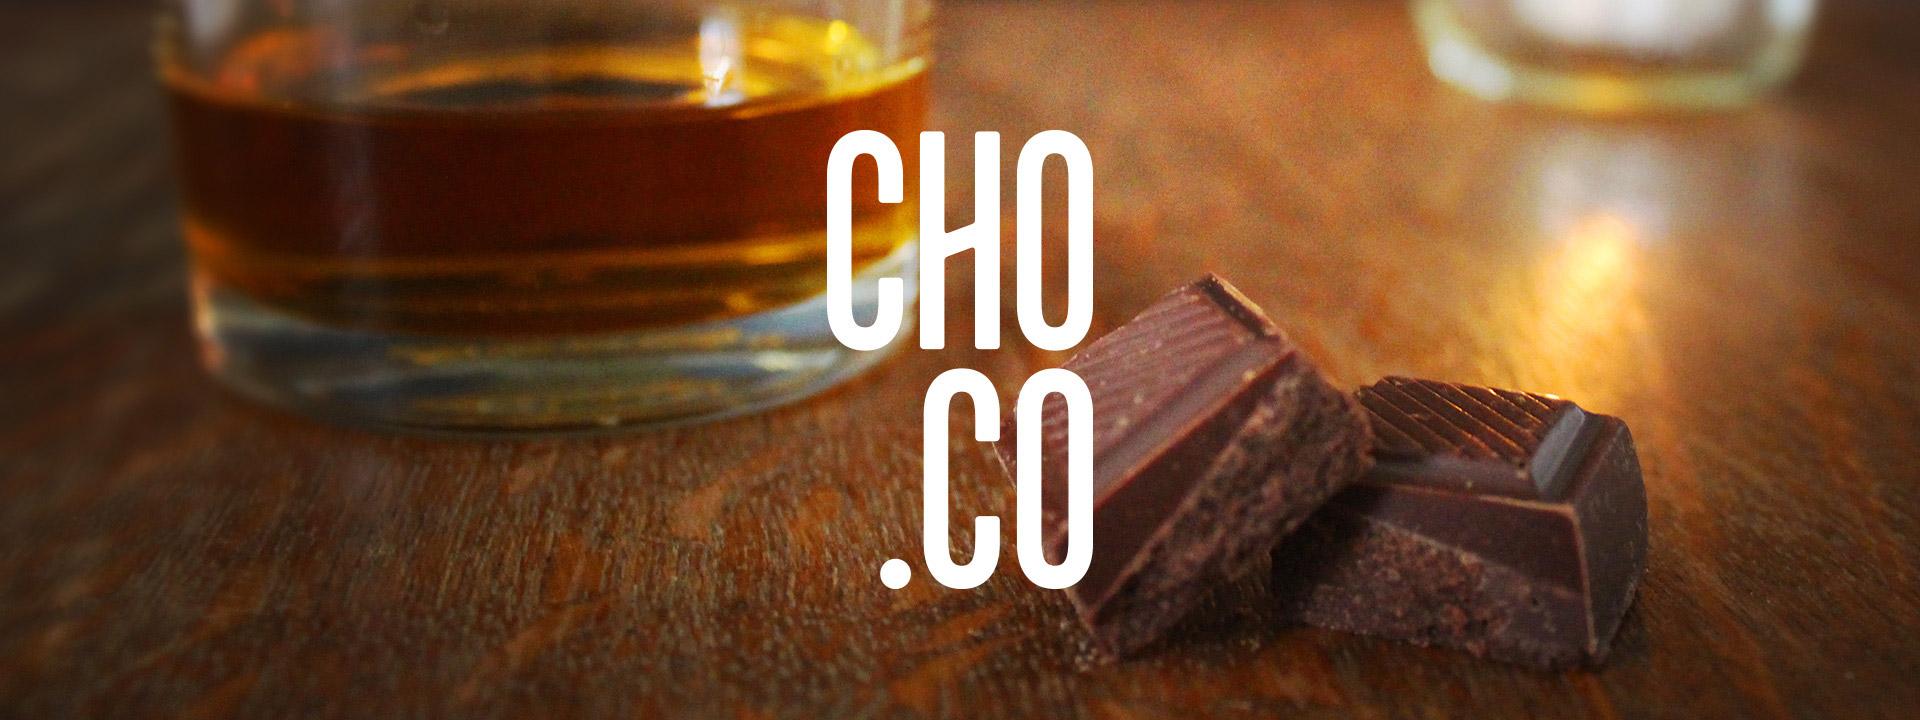 Choco - Chocolate Costa Rica